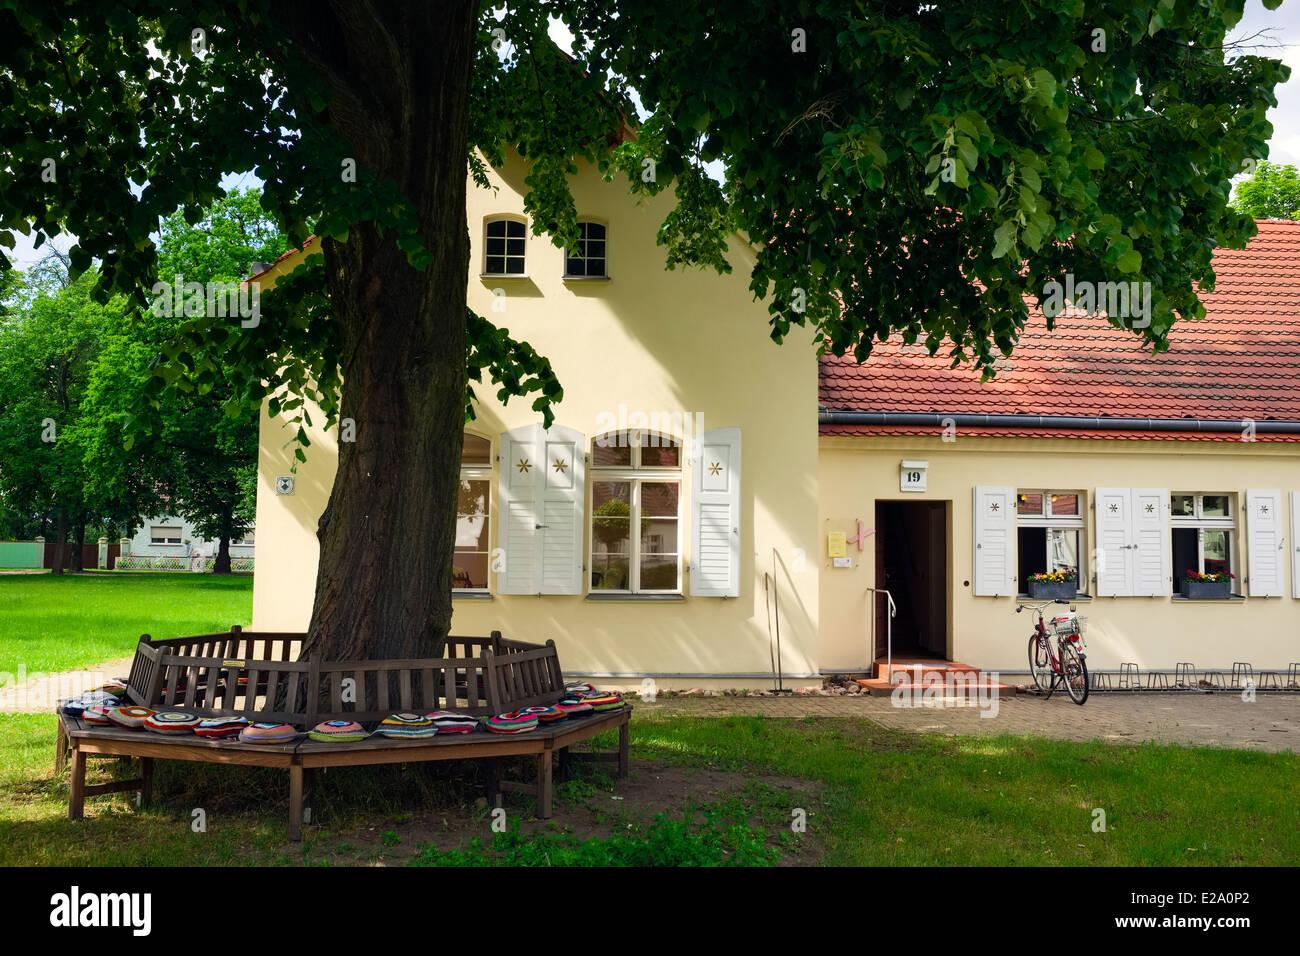 Community center, Saalow, Brandenburg, Germany - Stock Image